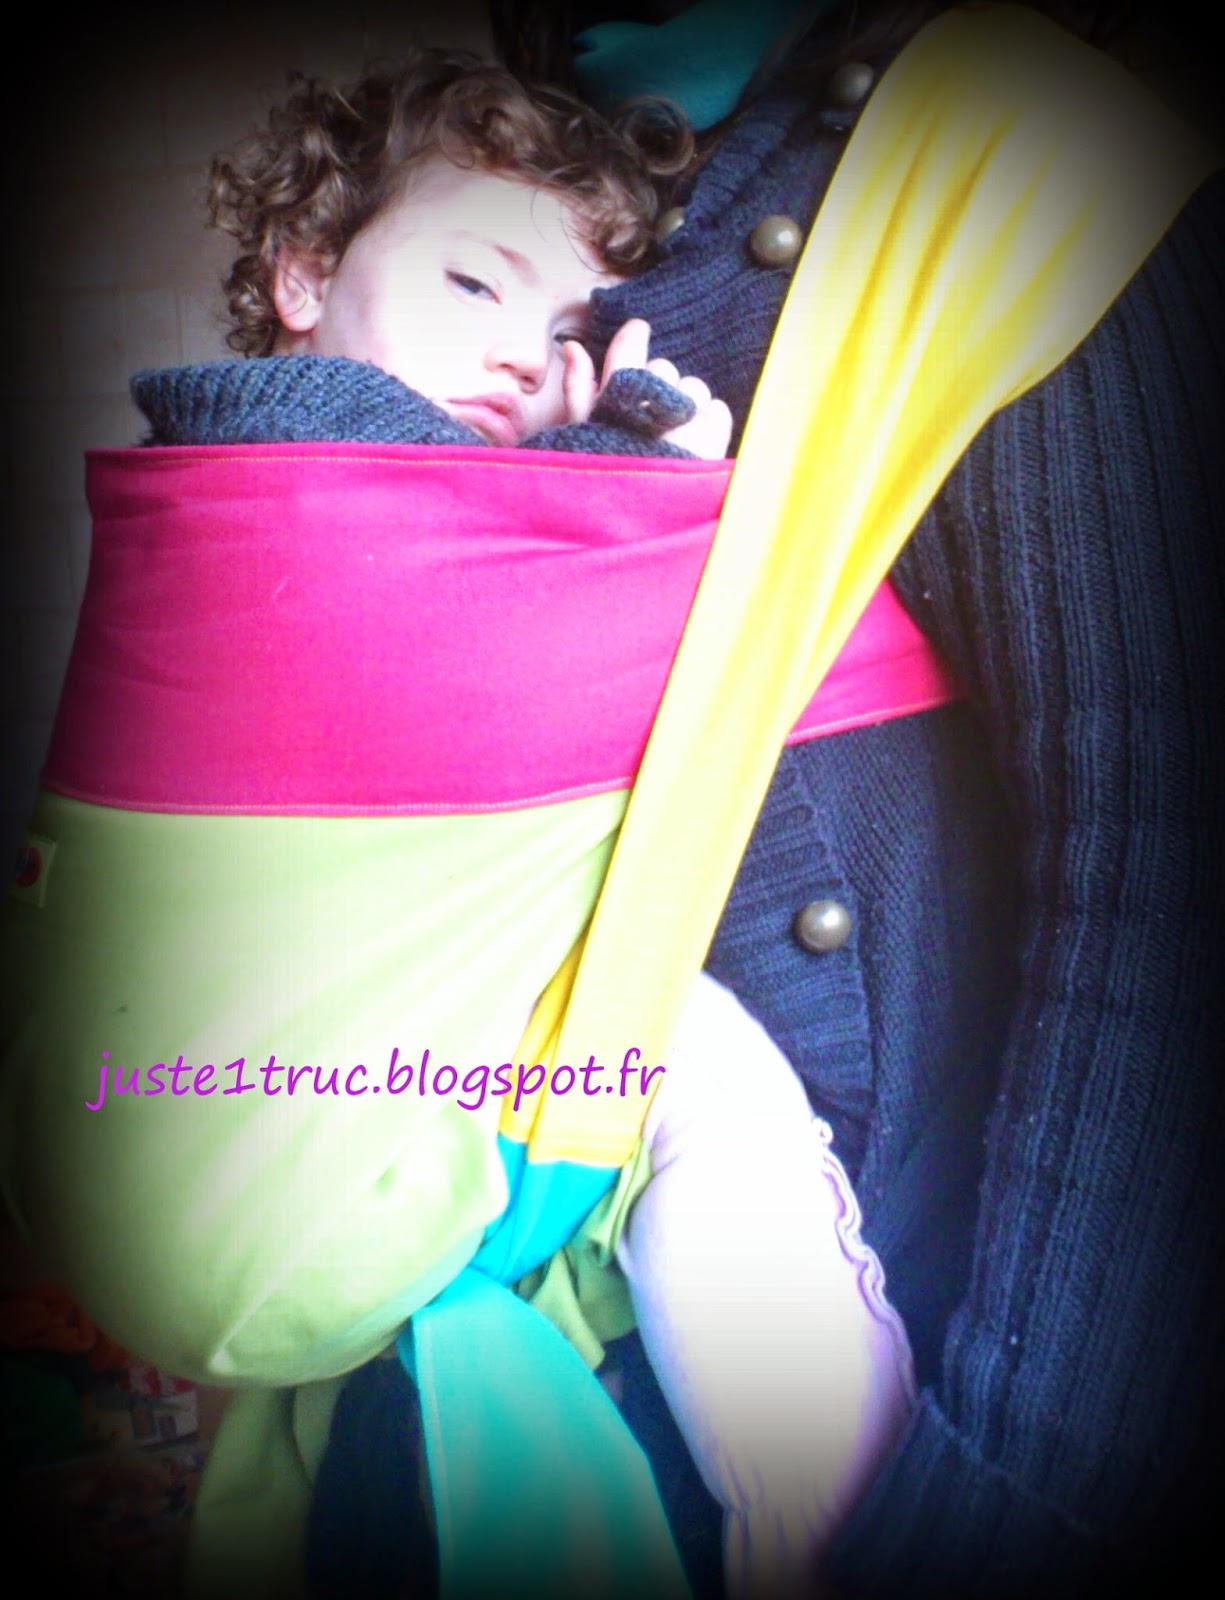 podeagi froid hiver soleil chaleur portage babywearing